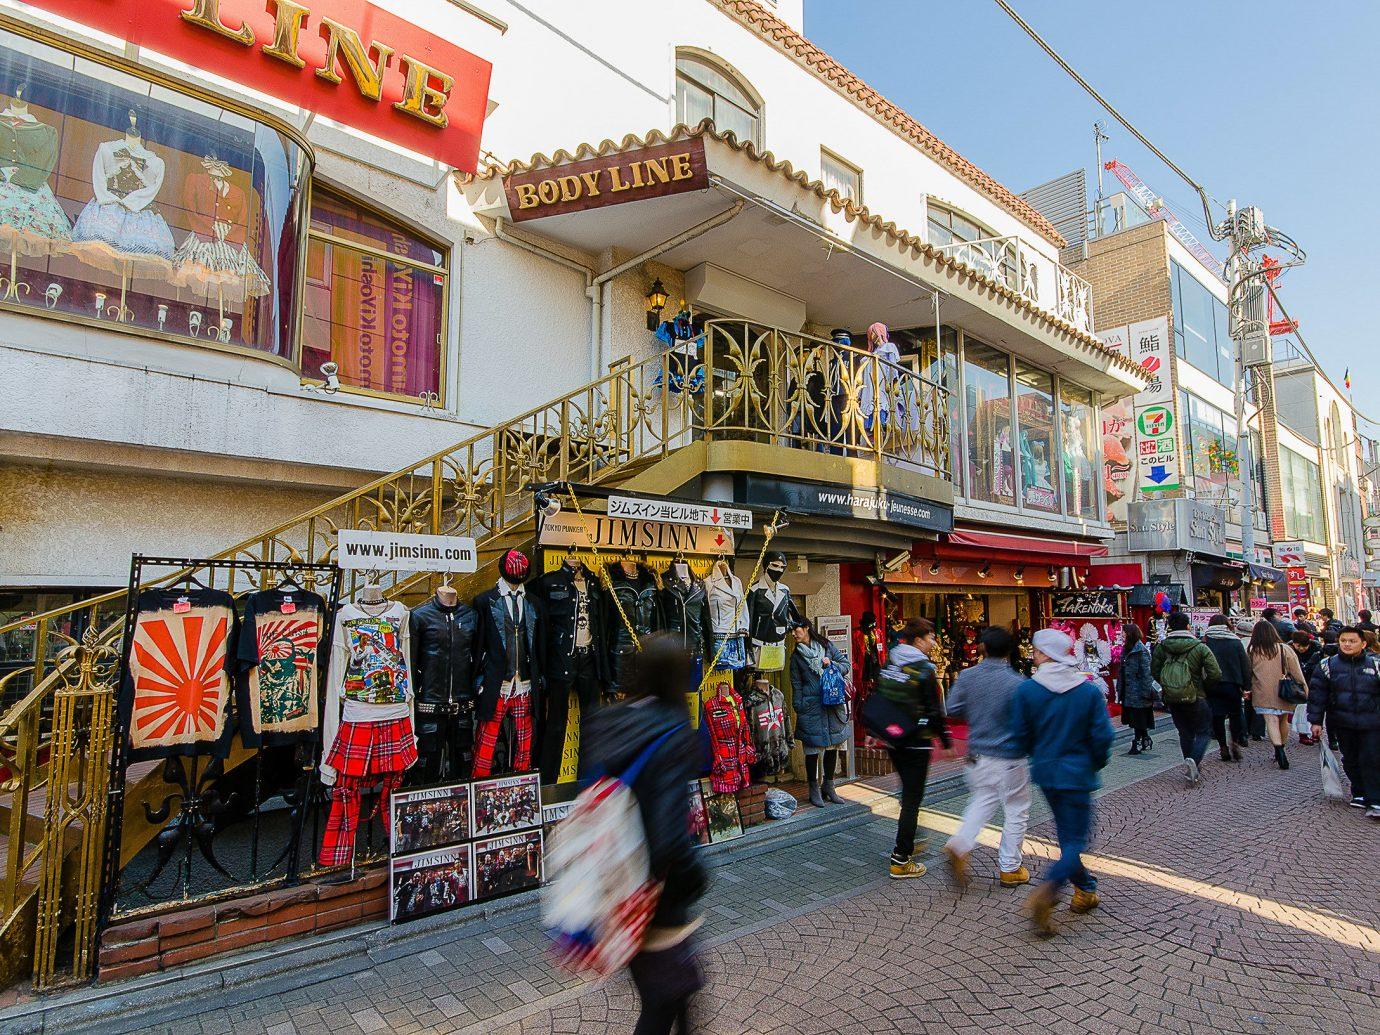 Trip Ideas sky outdoor landmark person walking street City temple fair people tourist attraction crowd tourism pedestrian recreation marketplace festival boardwalk